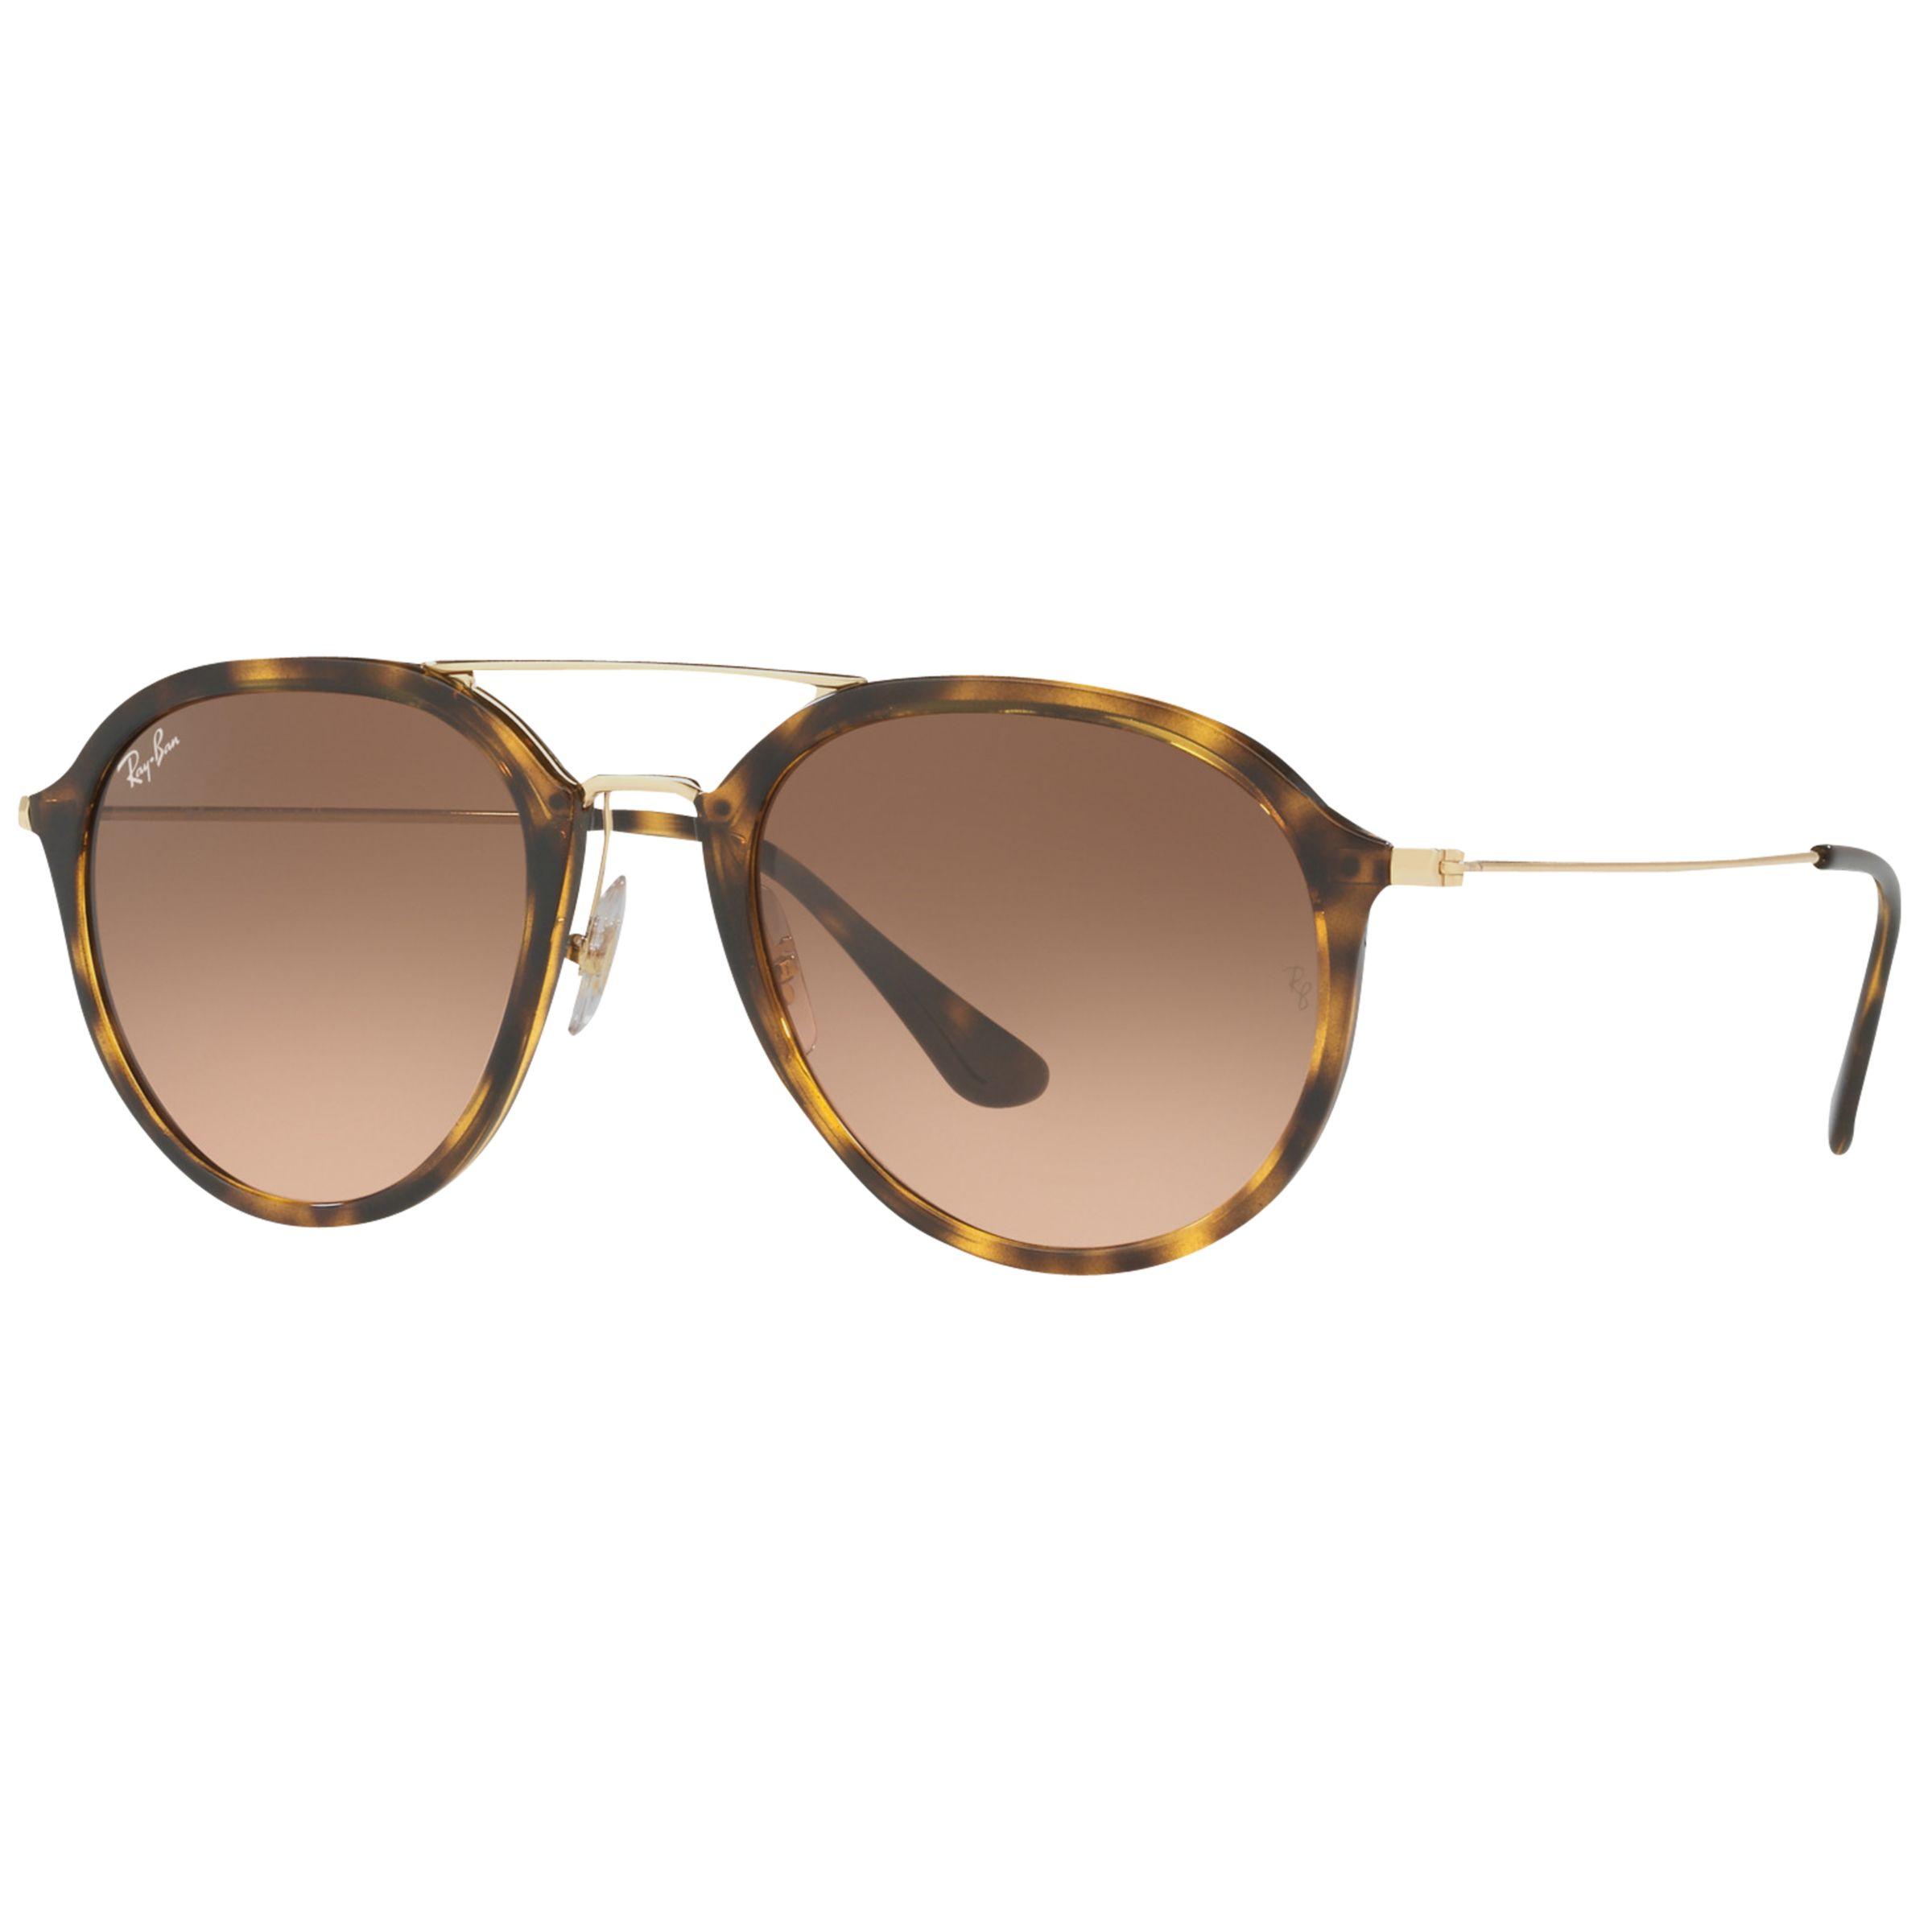 Ray-ban Ray-Ban RB4253 Aviator Sunglasses